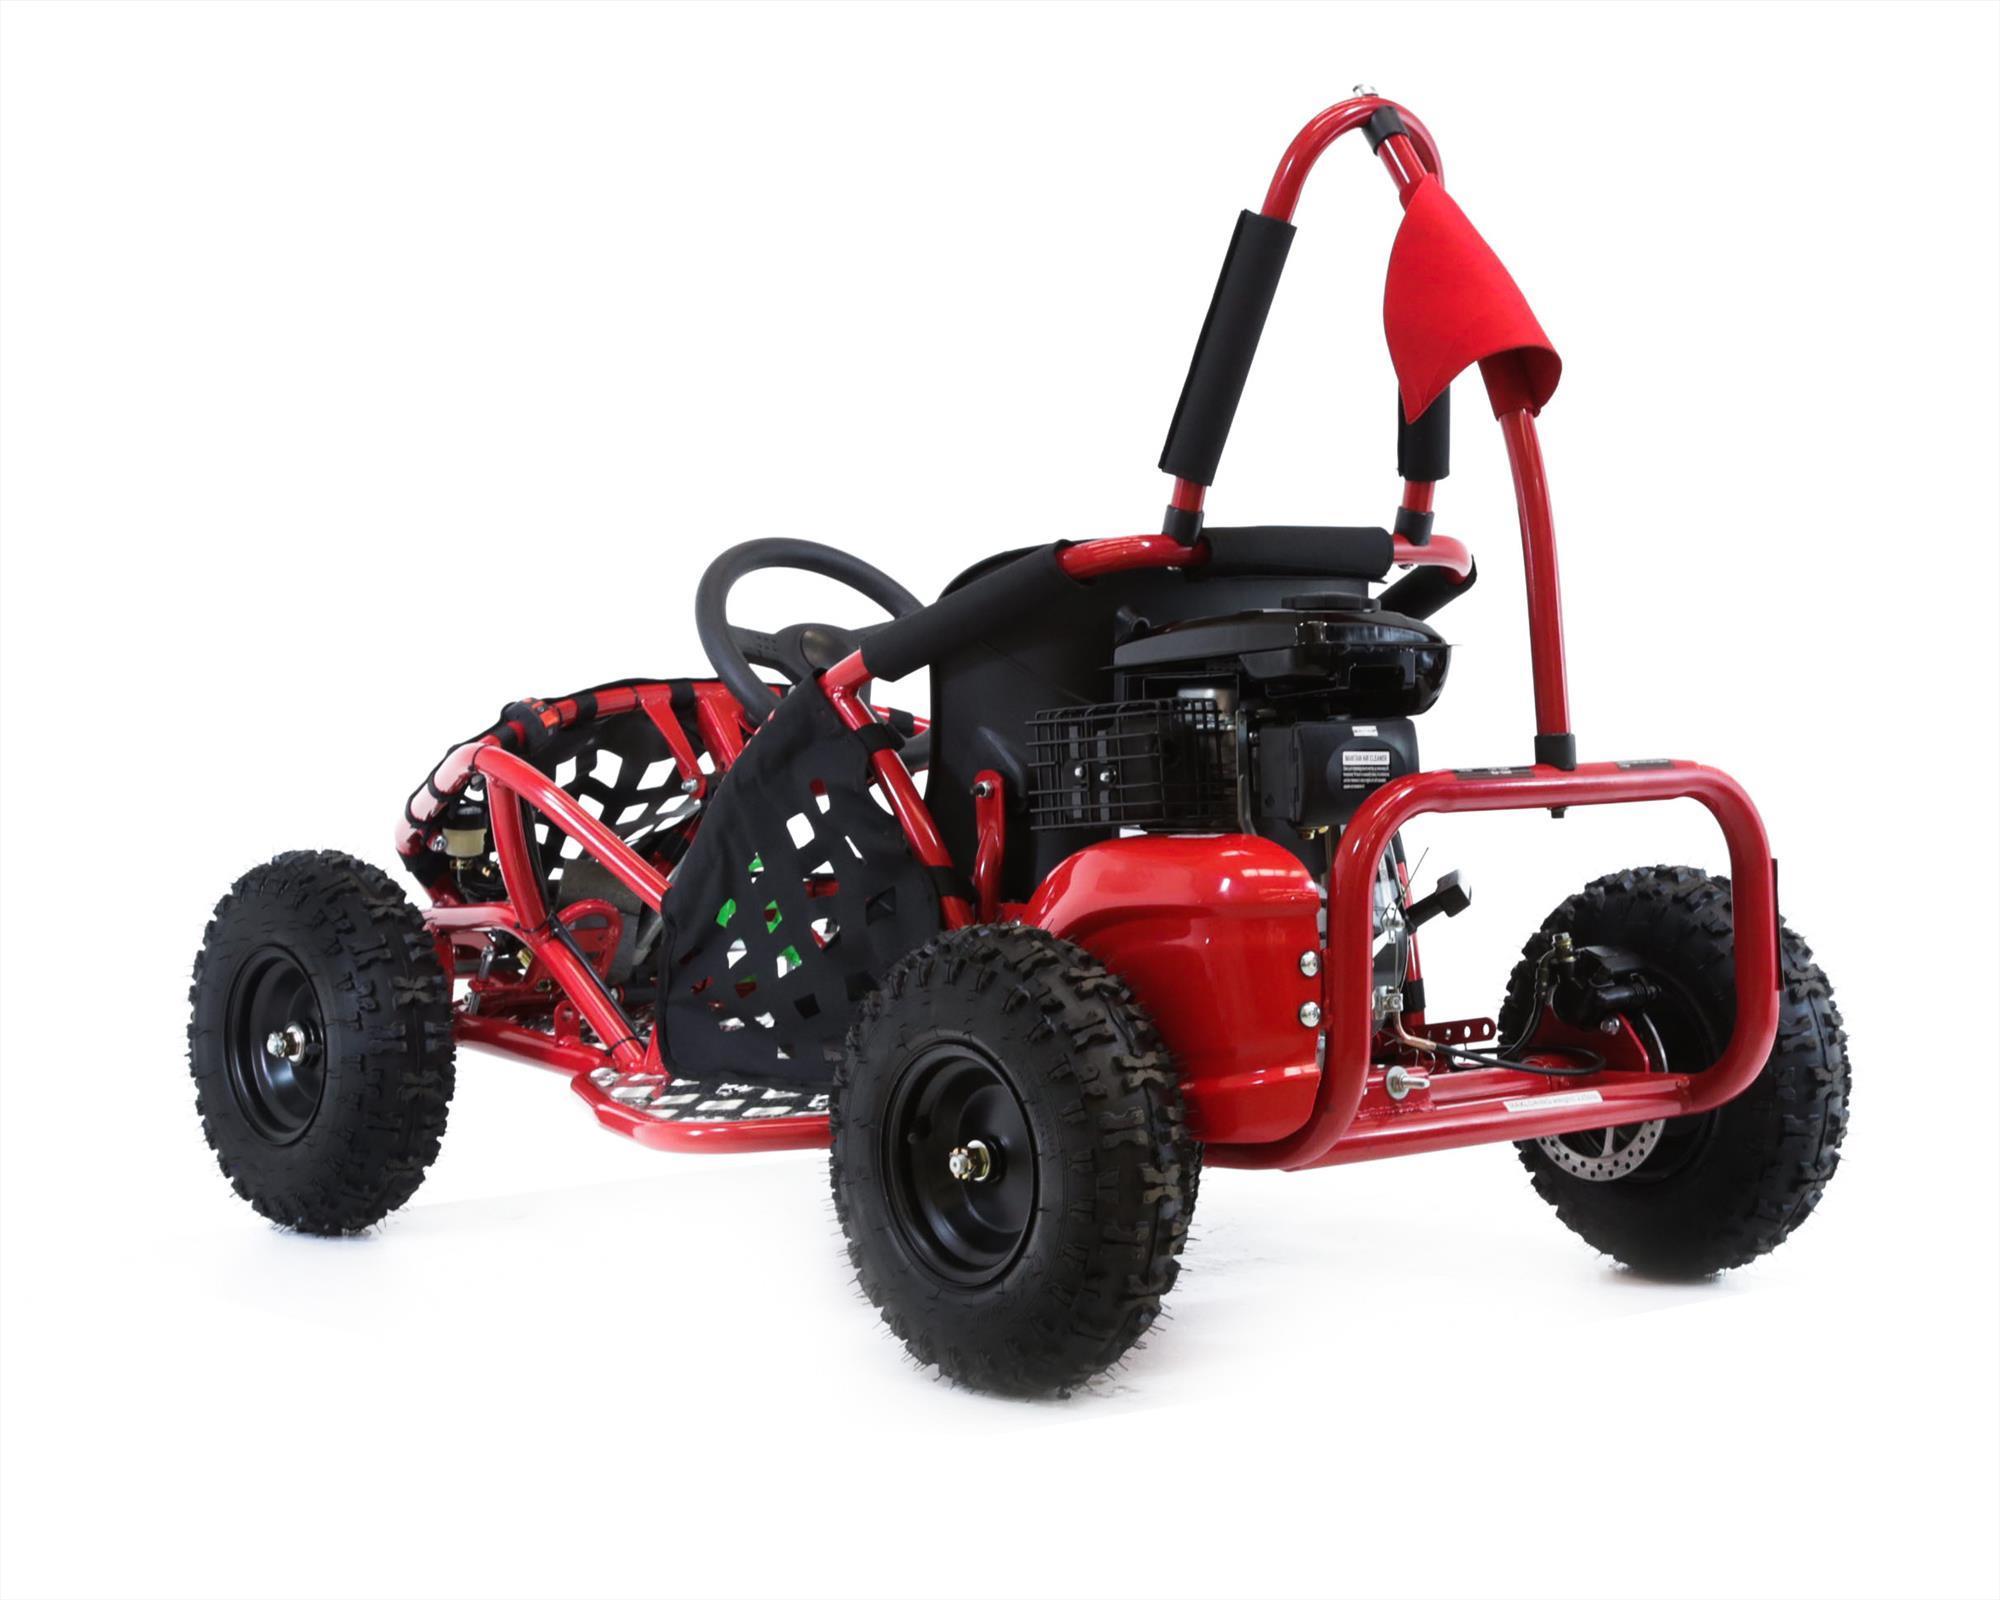 funbikes funkart 79cc petrol red kids mini go kart. Black Bedroom Furniture Sets. Home Design Ideas